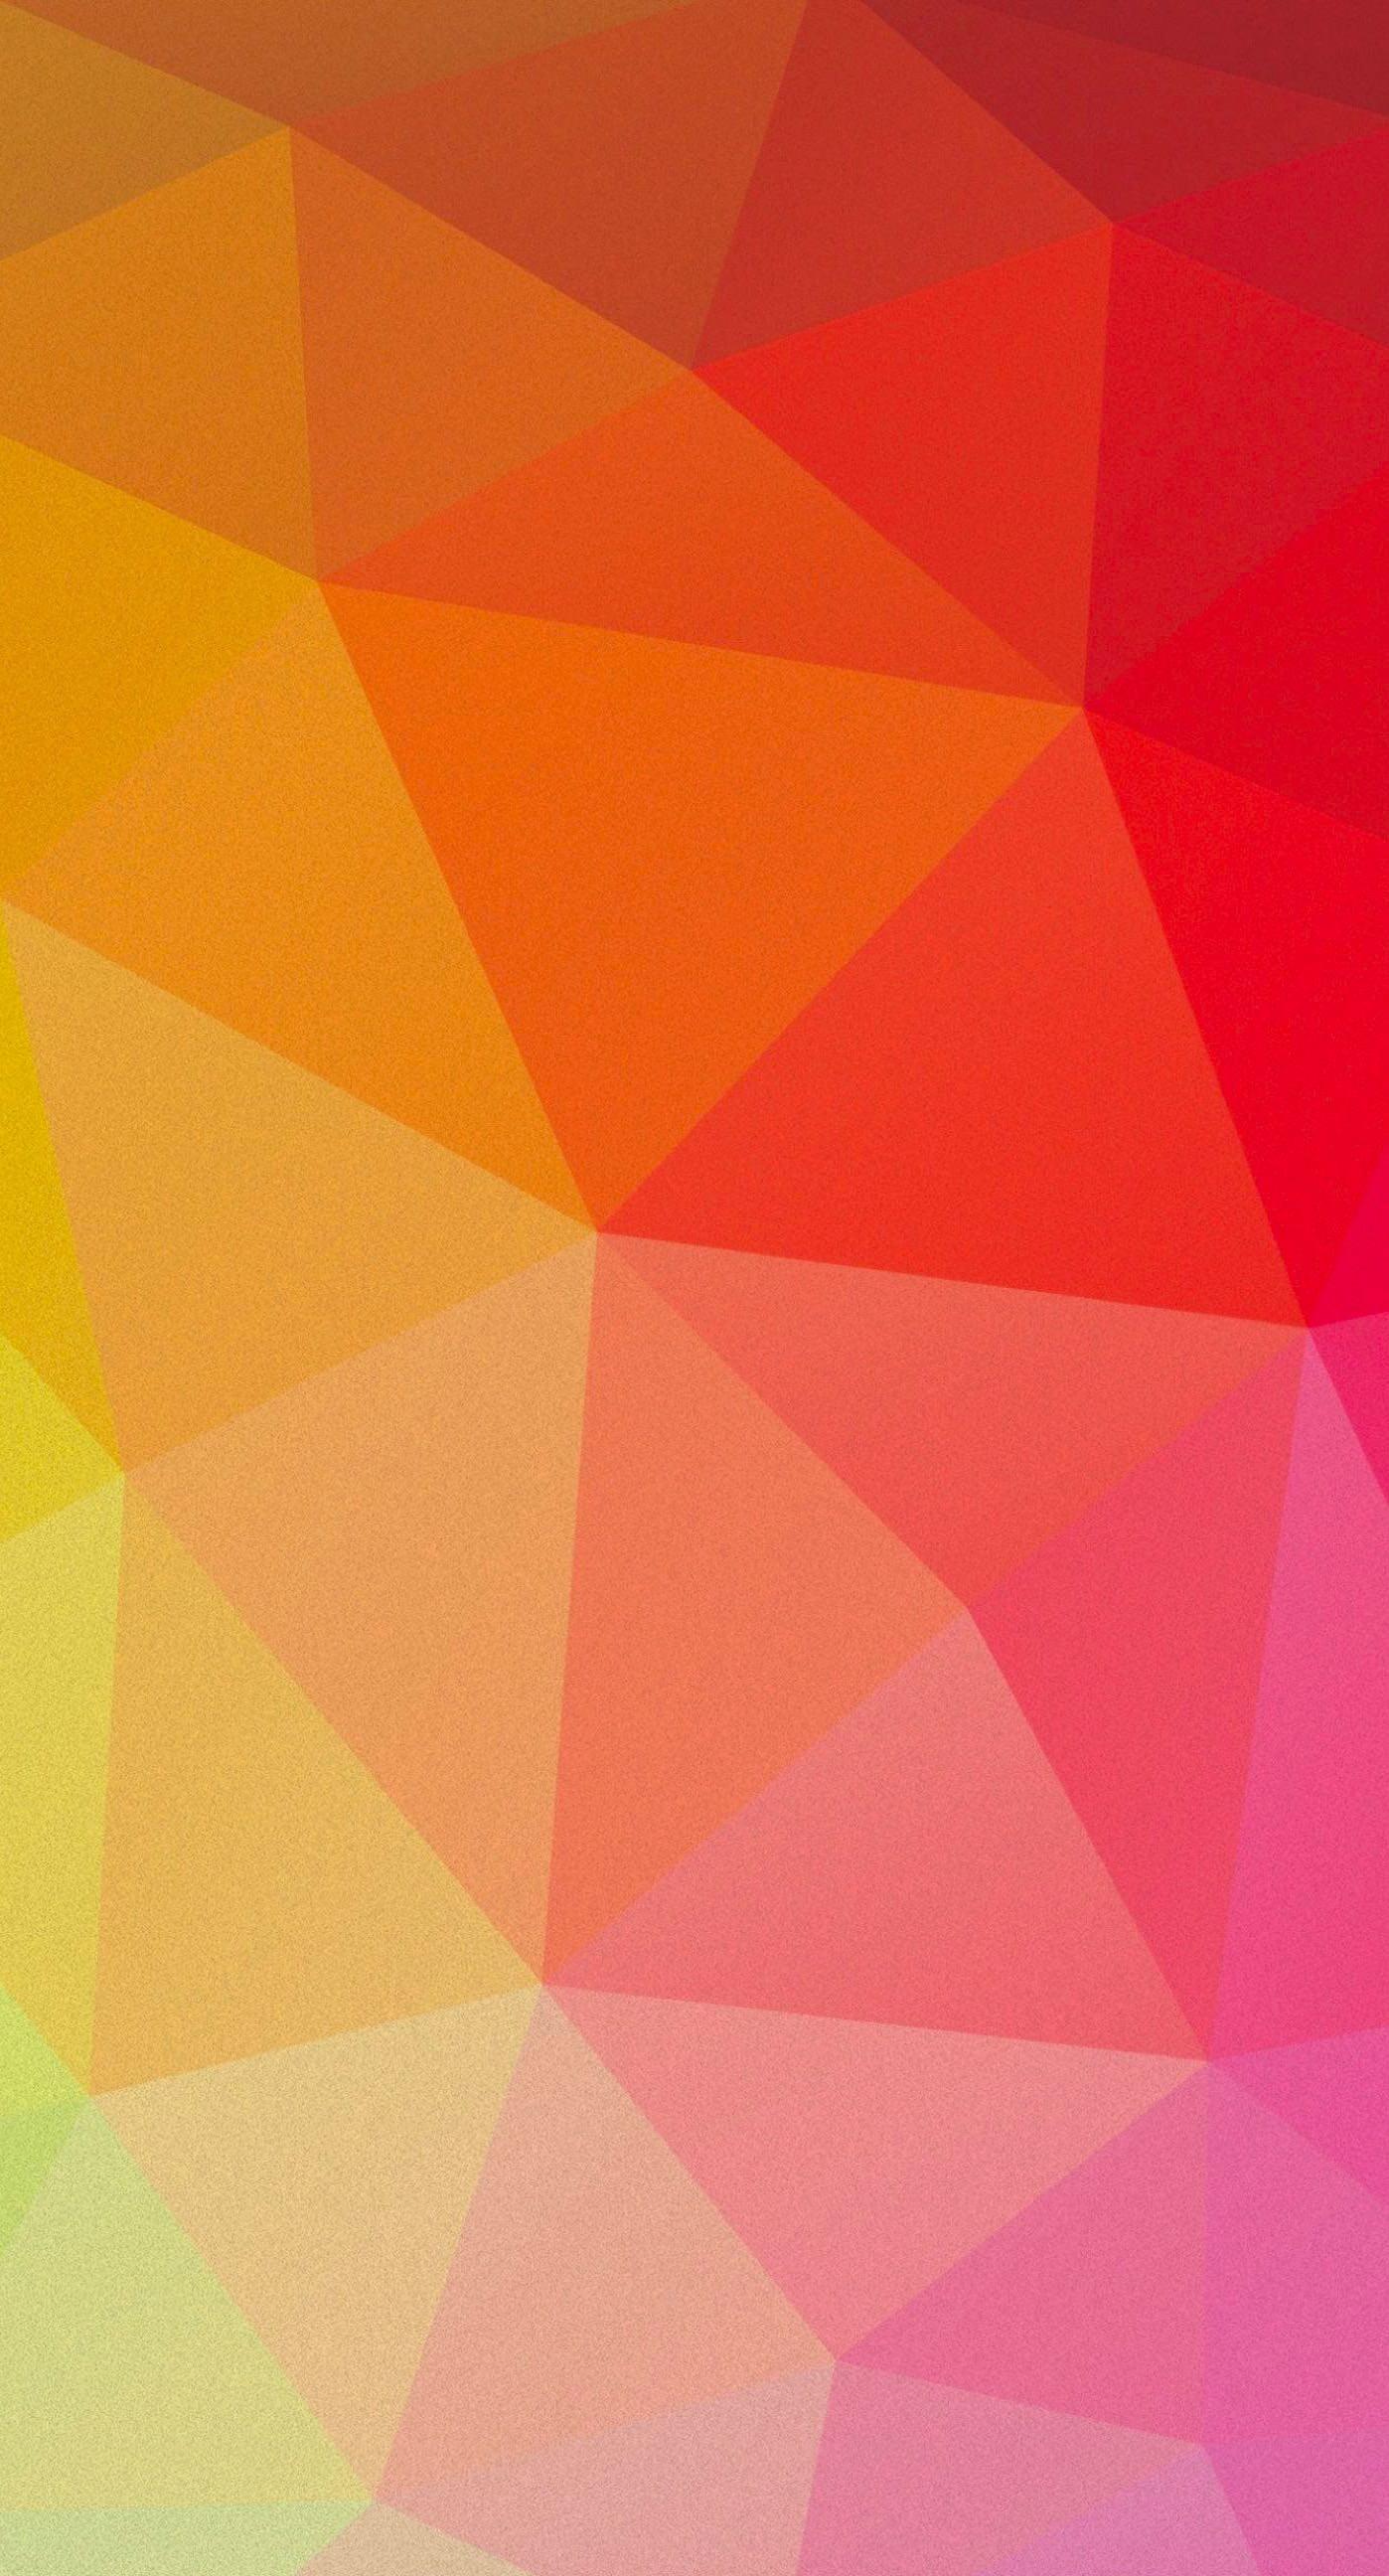 Pattern red orange peach yellow green | wallpaper.sc iPhone6Plus